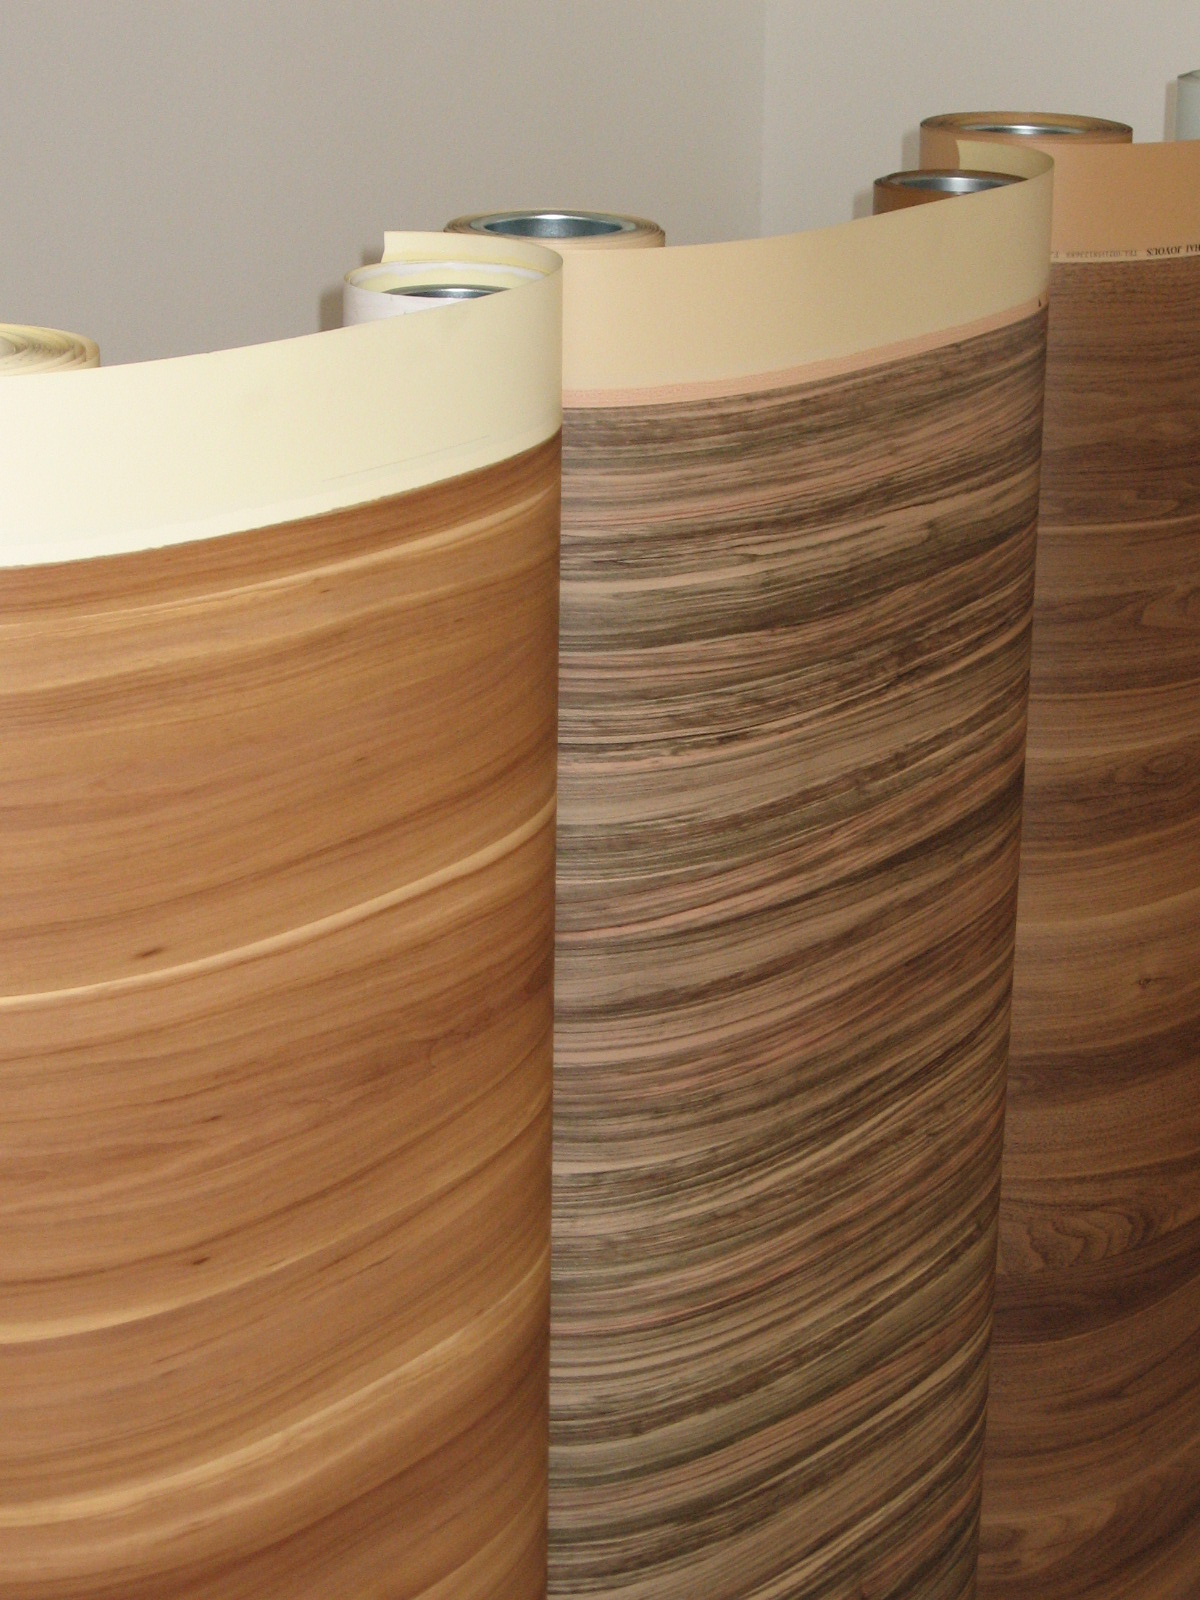 PVC Vinyl Wood Grain Film for Decoration